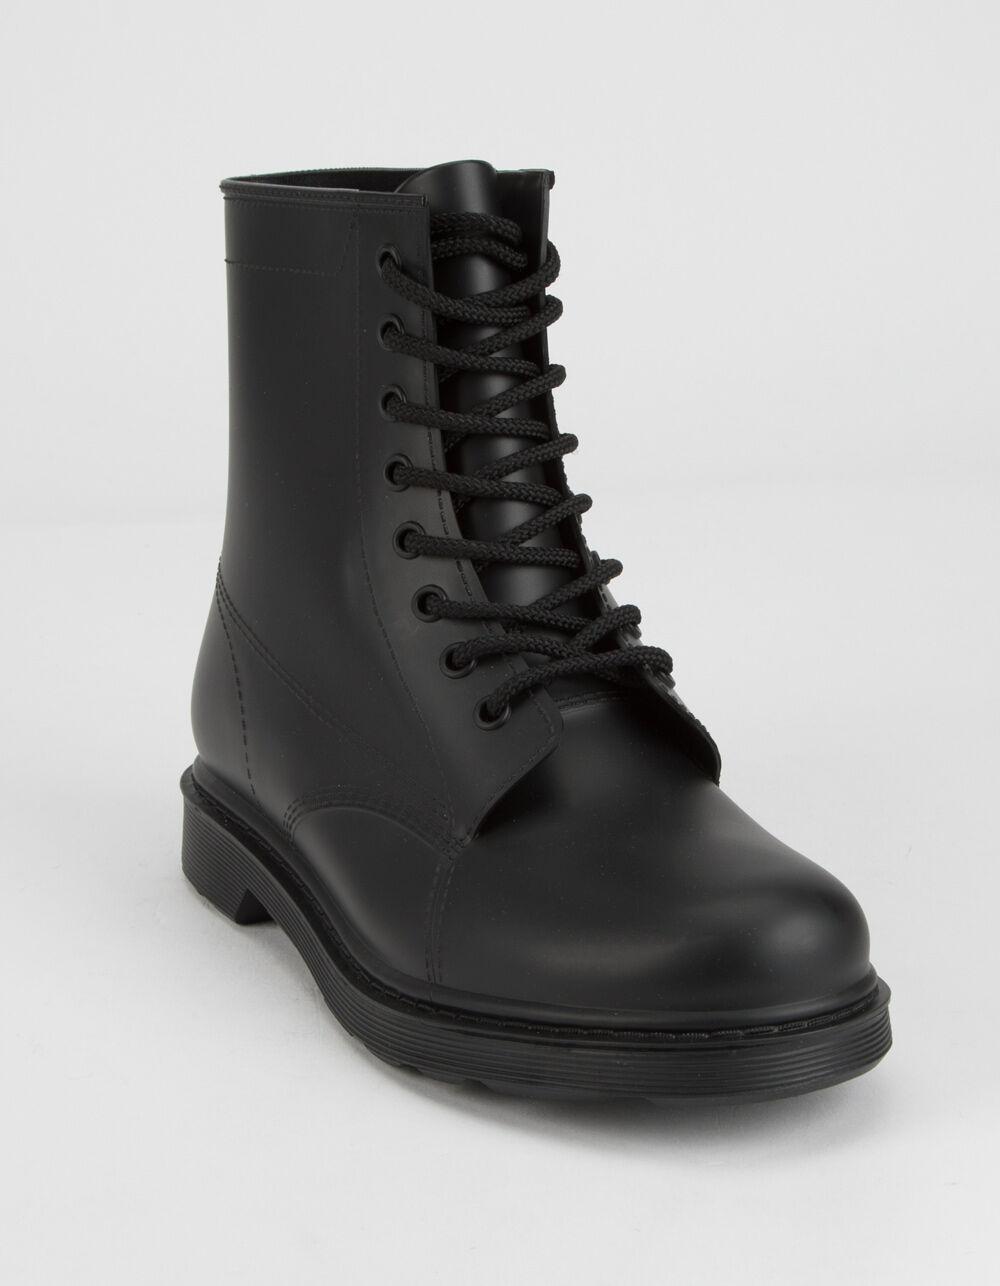 QUPID PVC Lace-Up Combat Boots